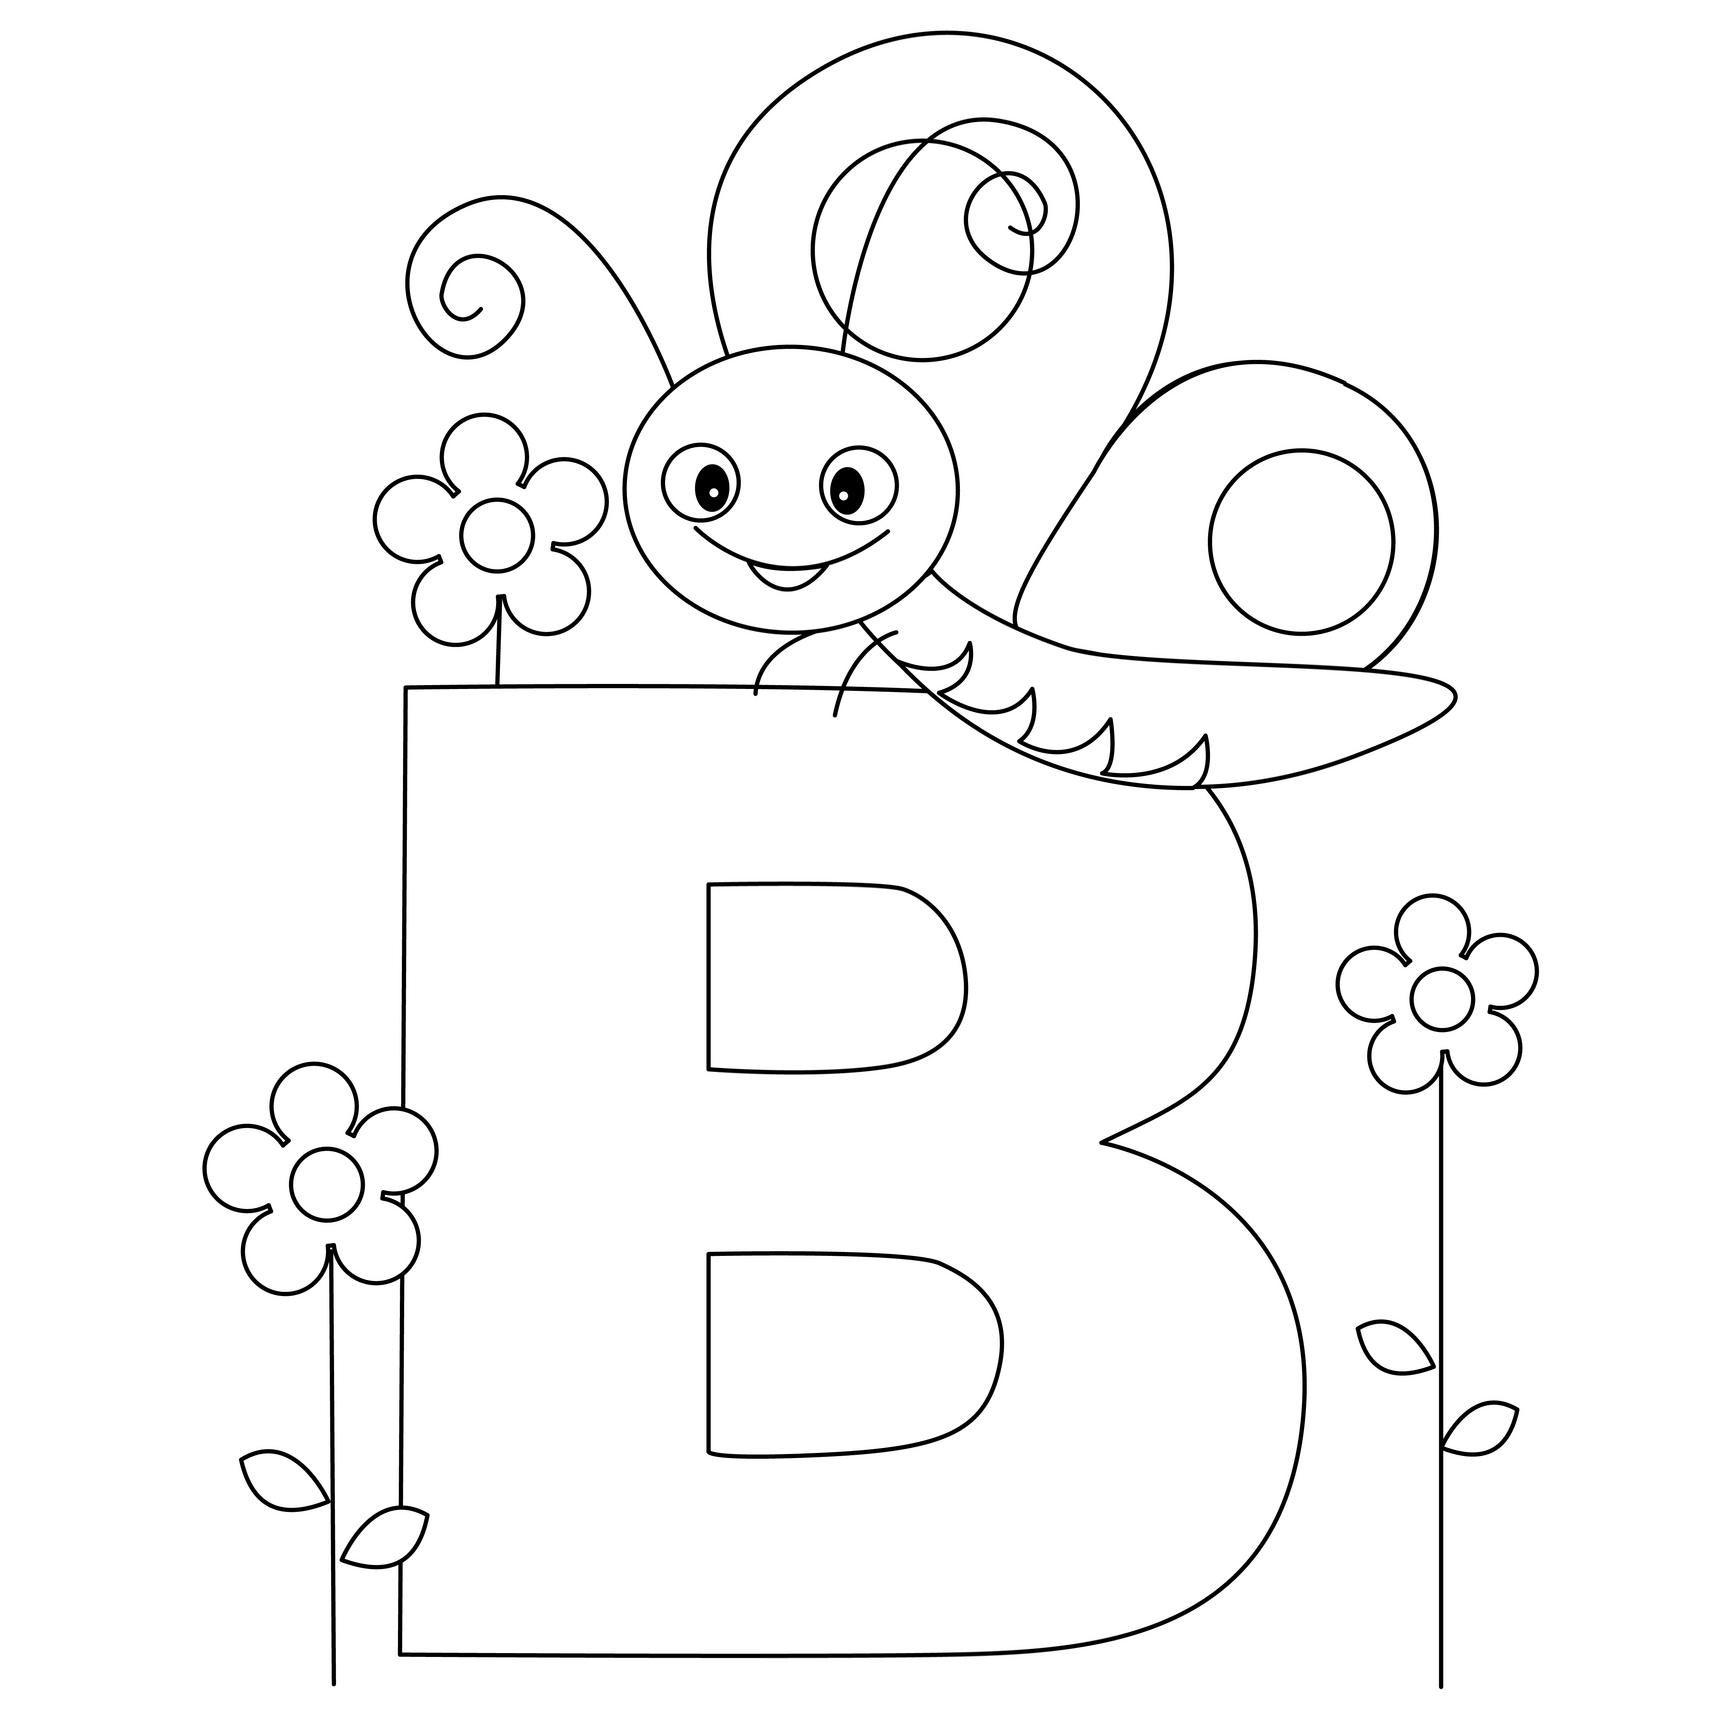 Letter B Coloring Page for Kindergarten